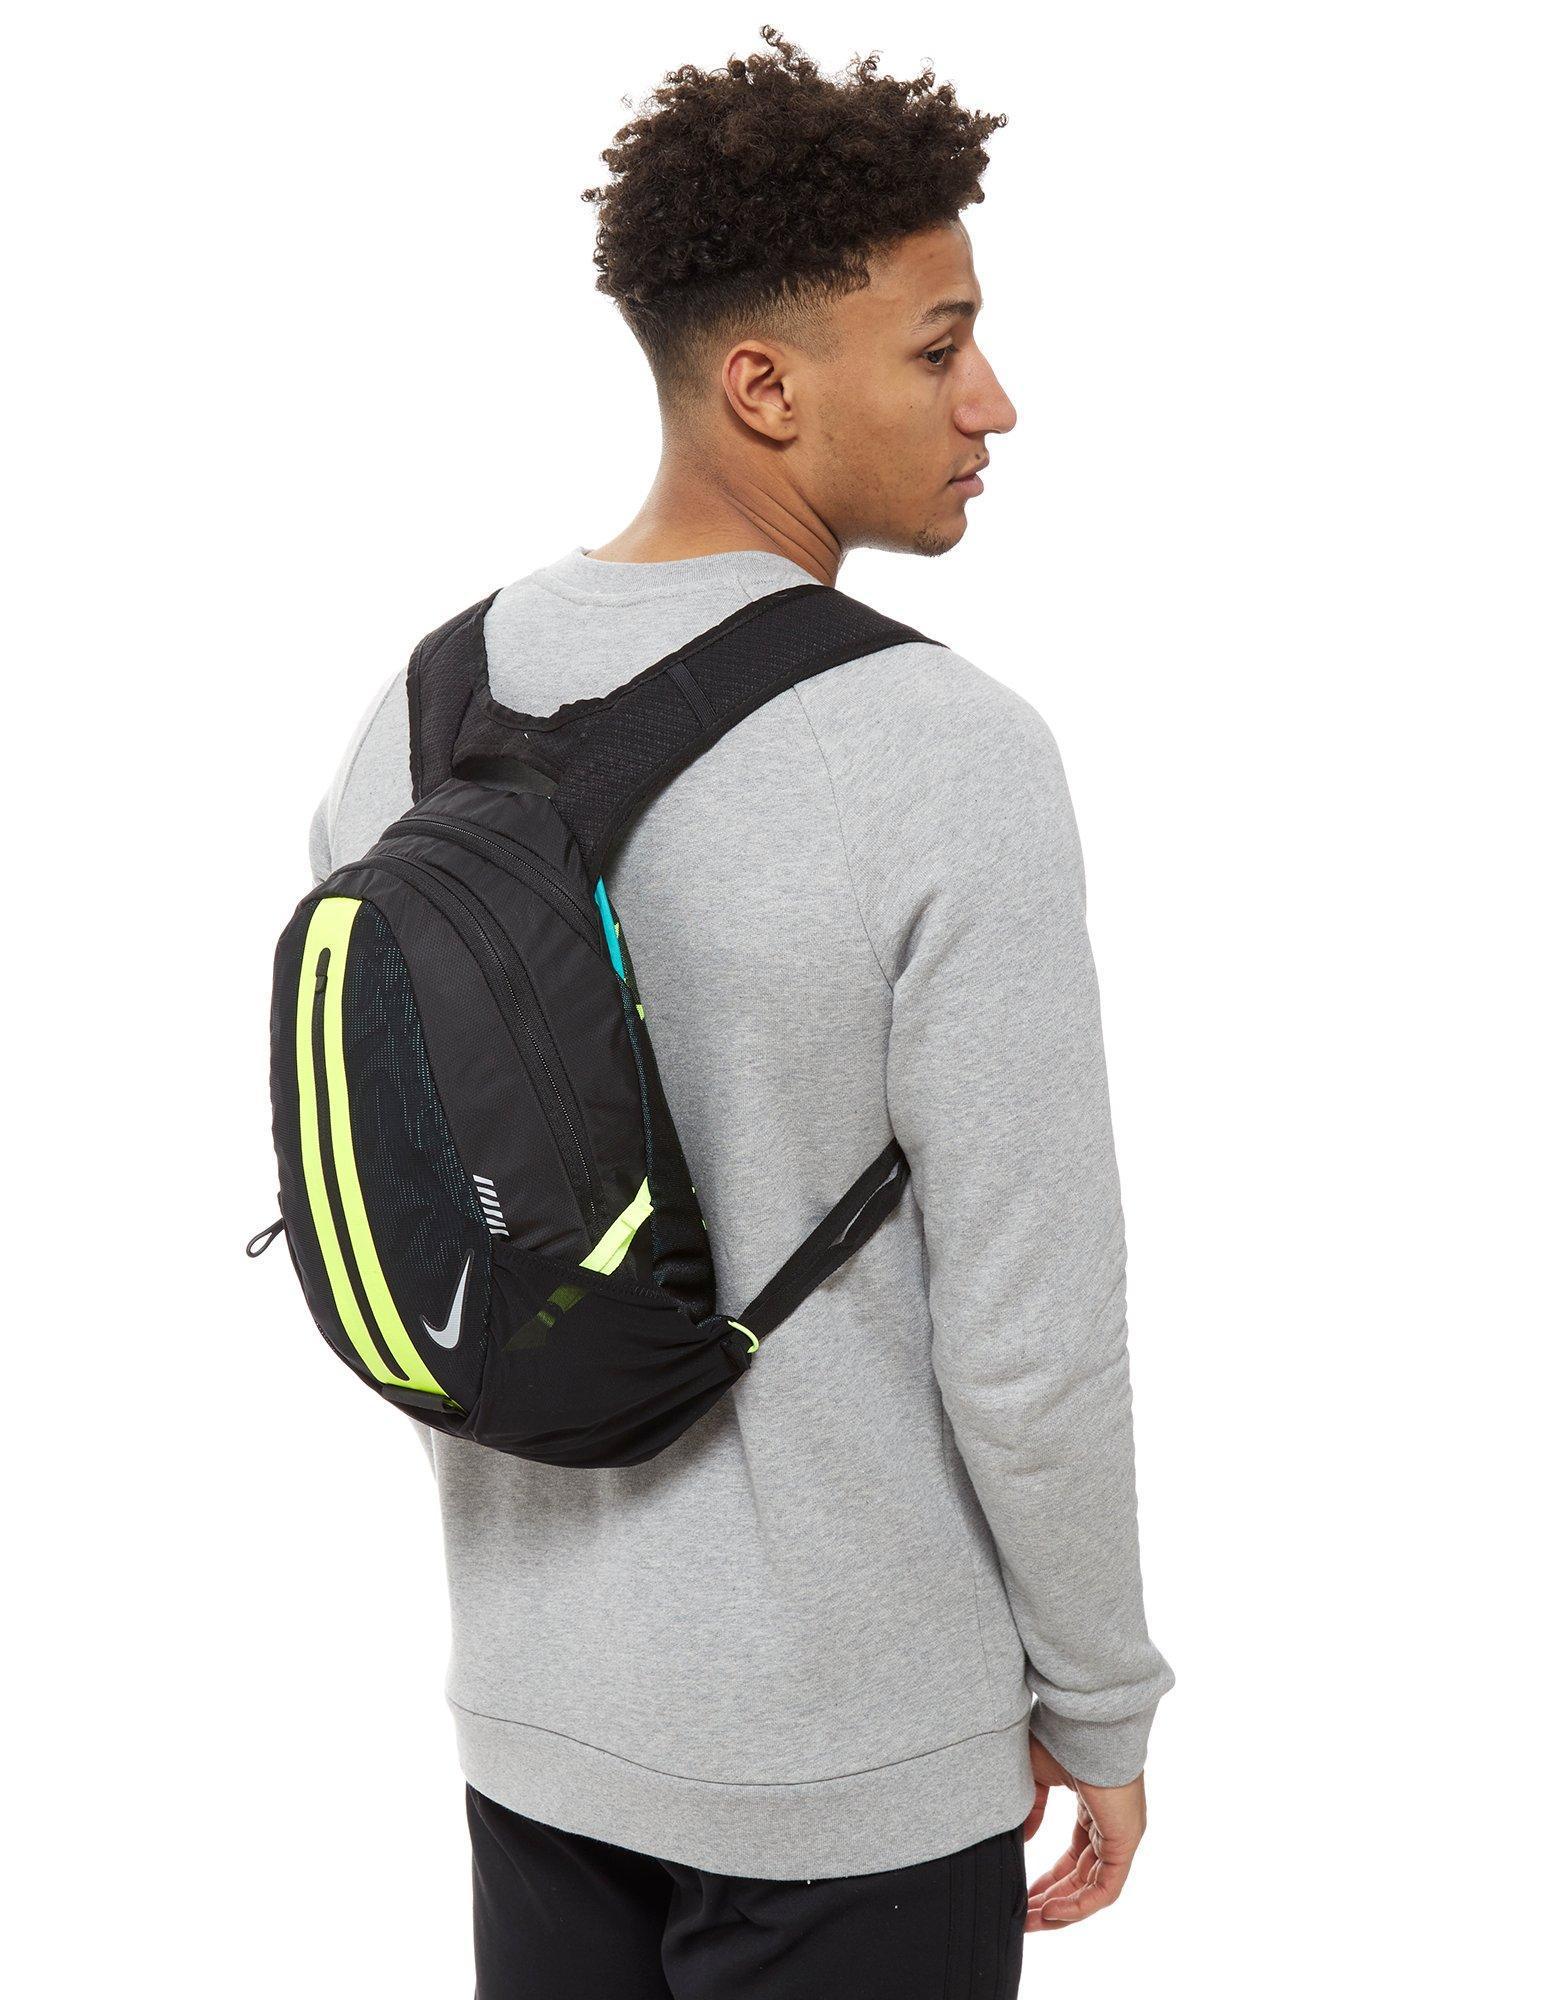 fa041d6fc Lyst - Nike Lightweight Running Backpack in Black for Men